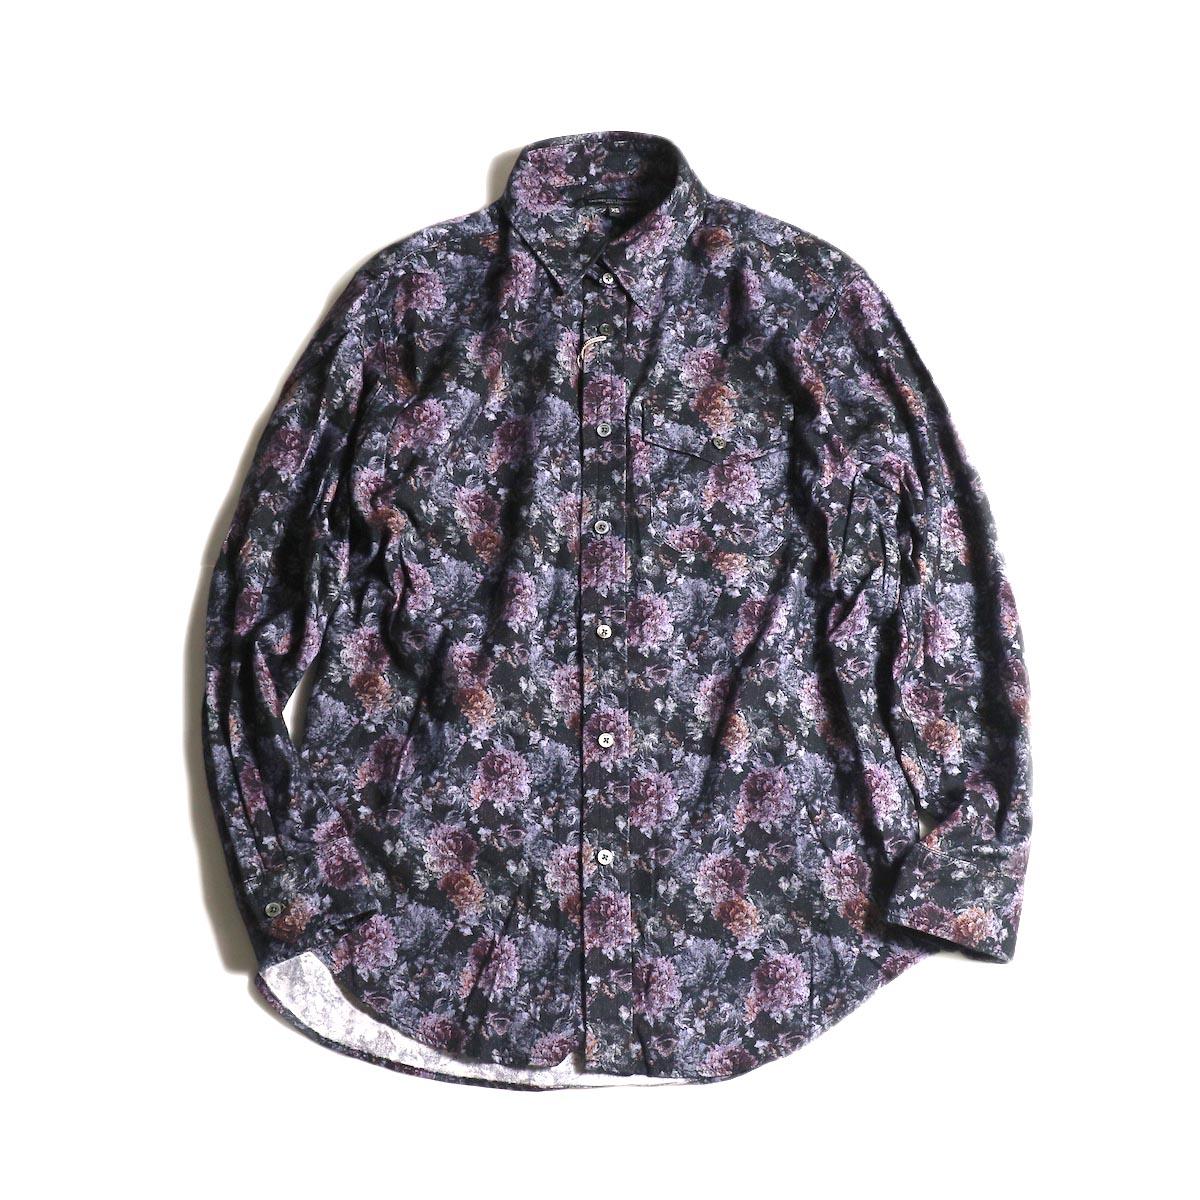 Engineered Garments / Tab Collar Shirt  -Floral Print (Purple)